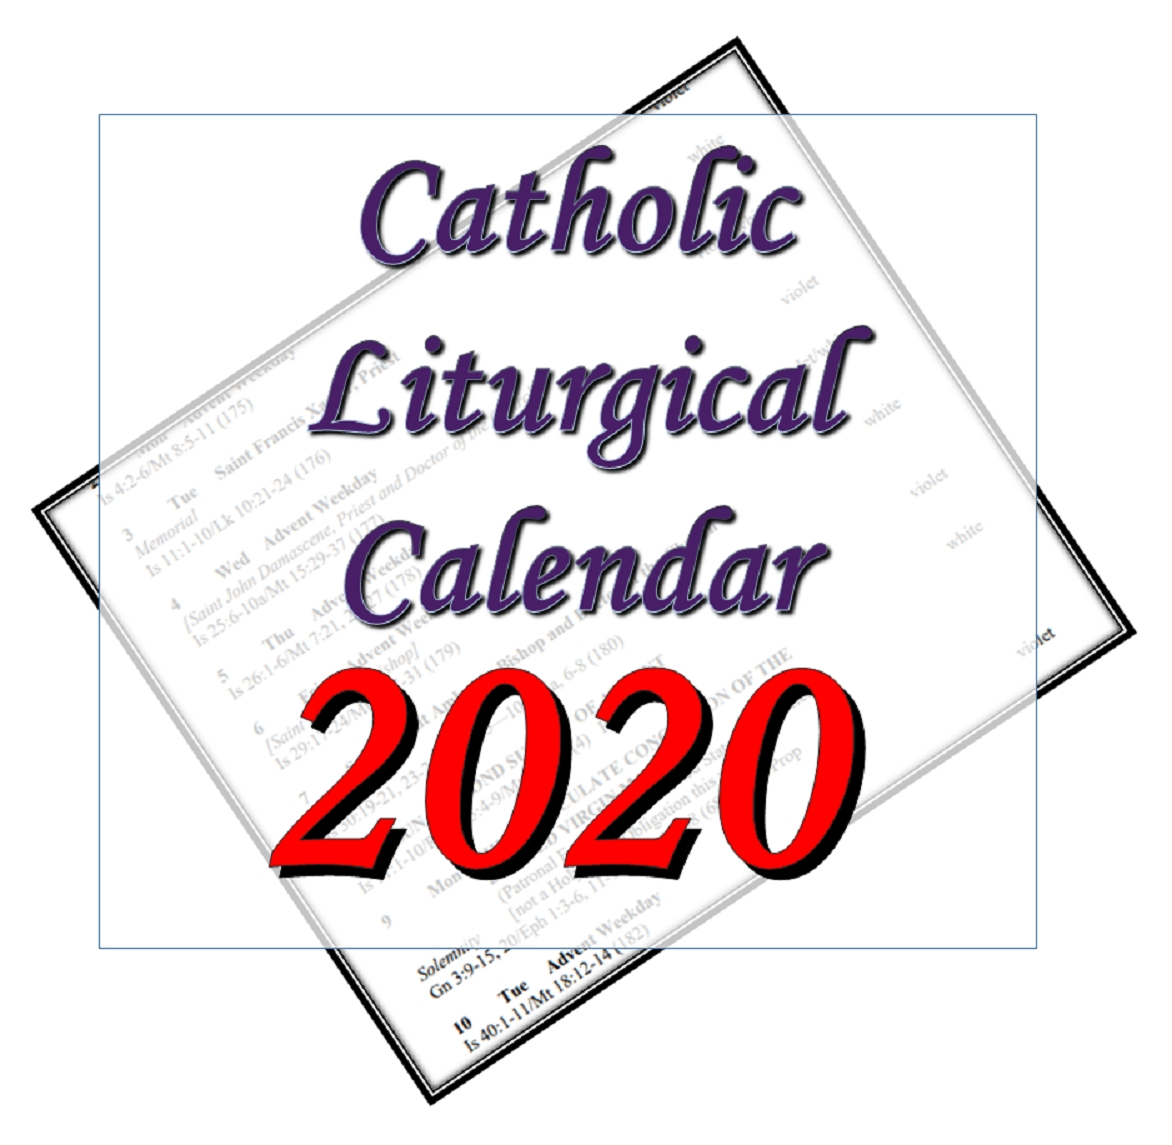 Liturgytools: Catholic Liturgical Calendars For 2020 intended for How Many Days In Liturgical Calendar Compared To Regular Calendar